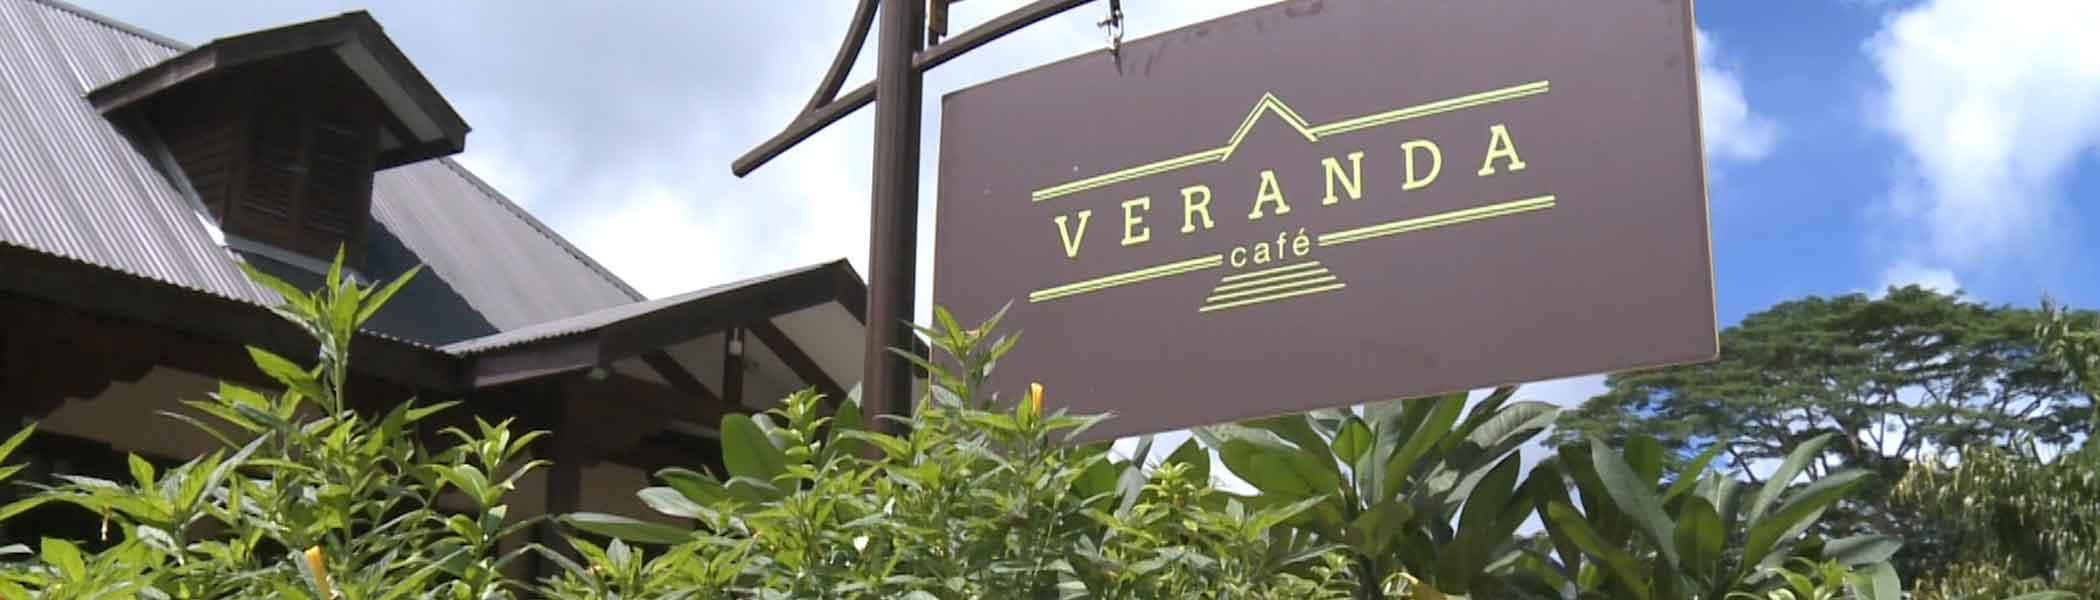 veranda-cafe, Bars and restaurants in Seychelles Islands